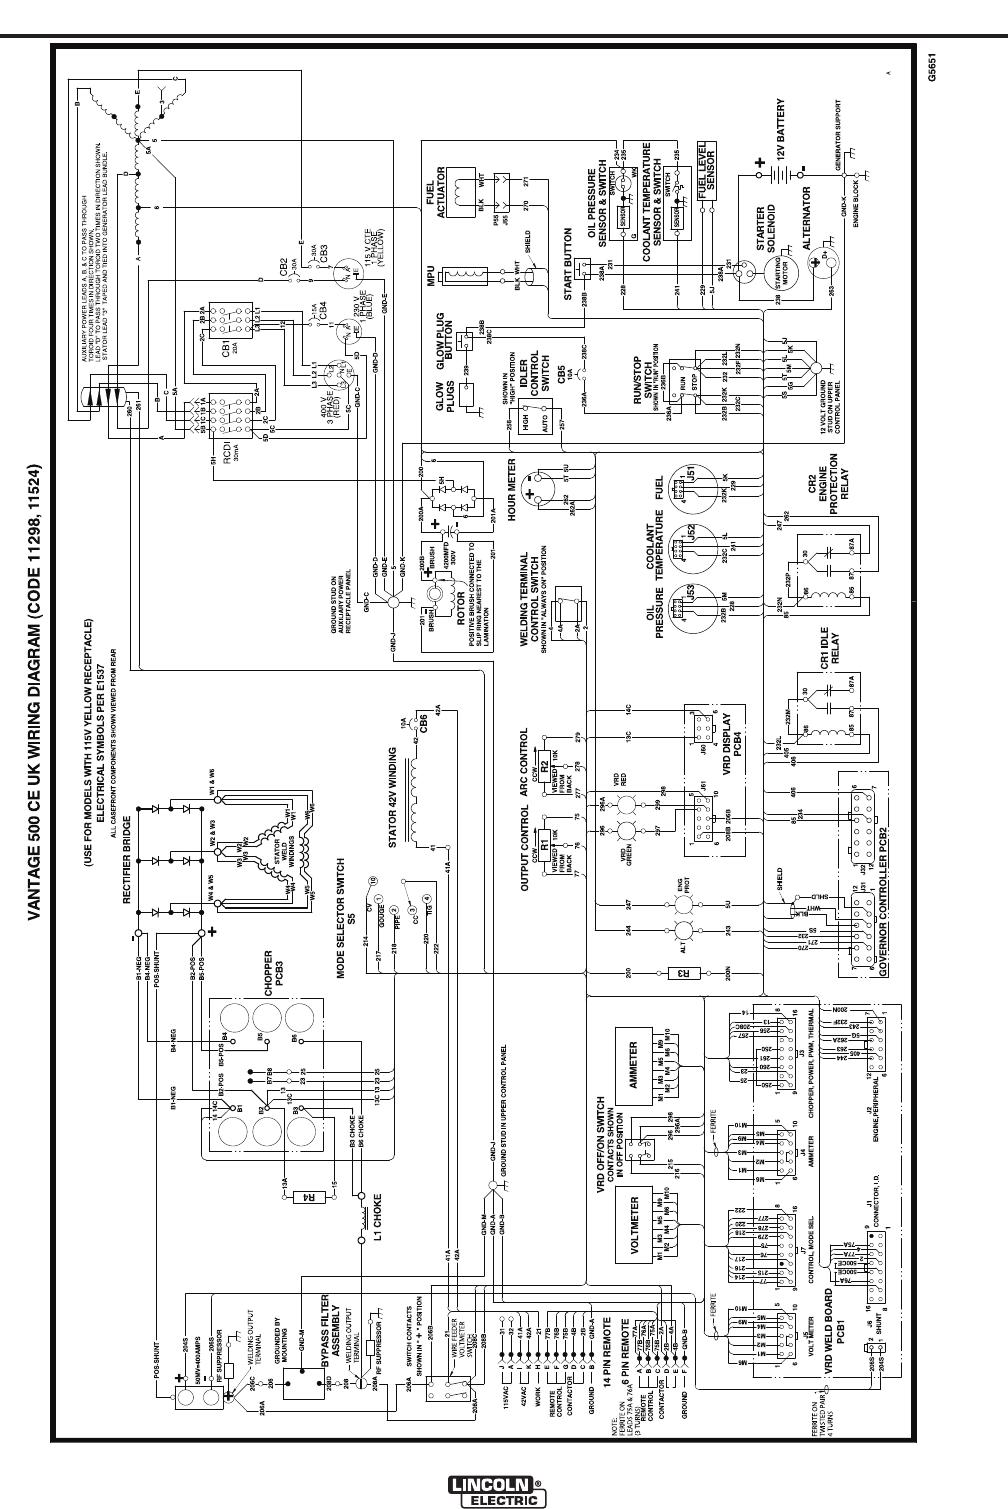 lincoln electric vantage 500 ce im894 b users manual. Black Bedroom Furniture Sets. Home Design Ideas